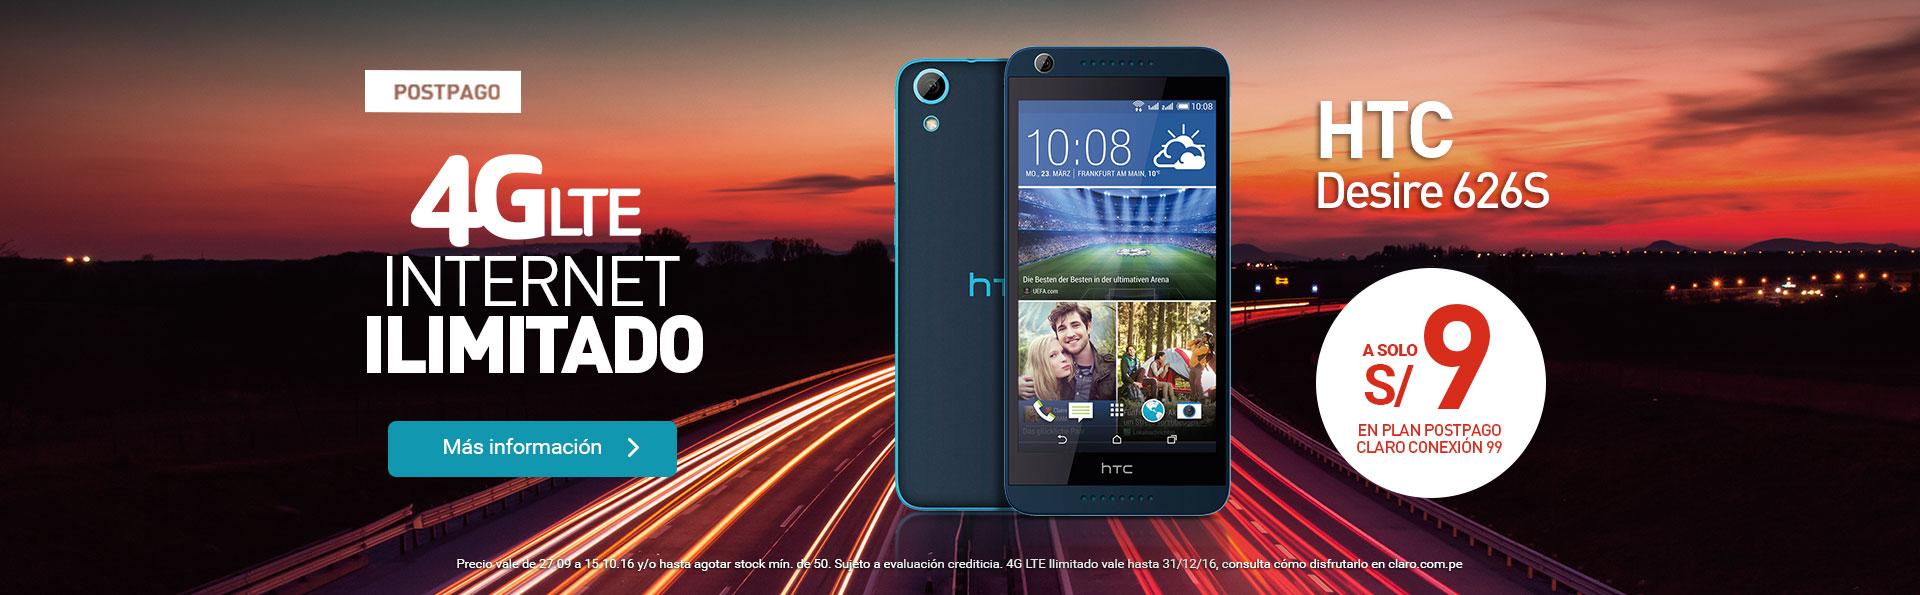 HTC_Desire_626s_postpago